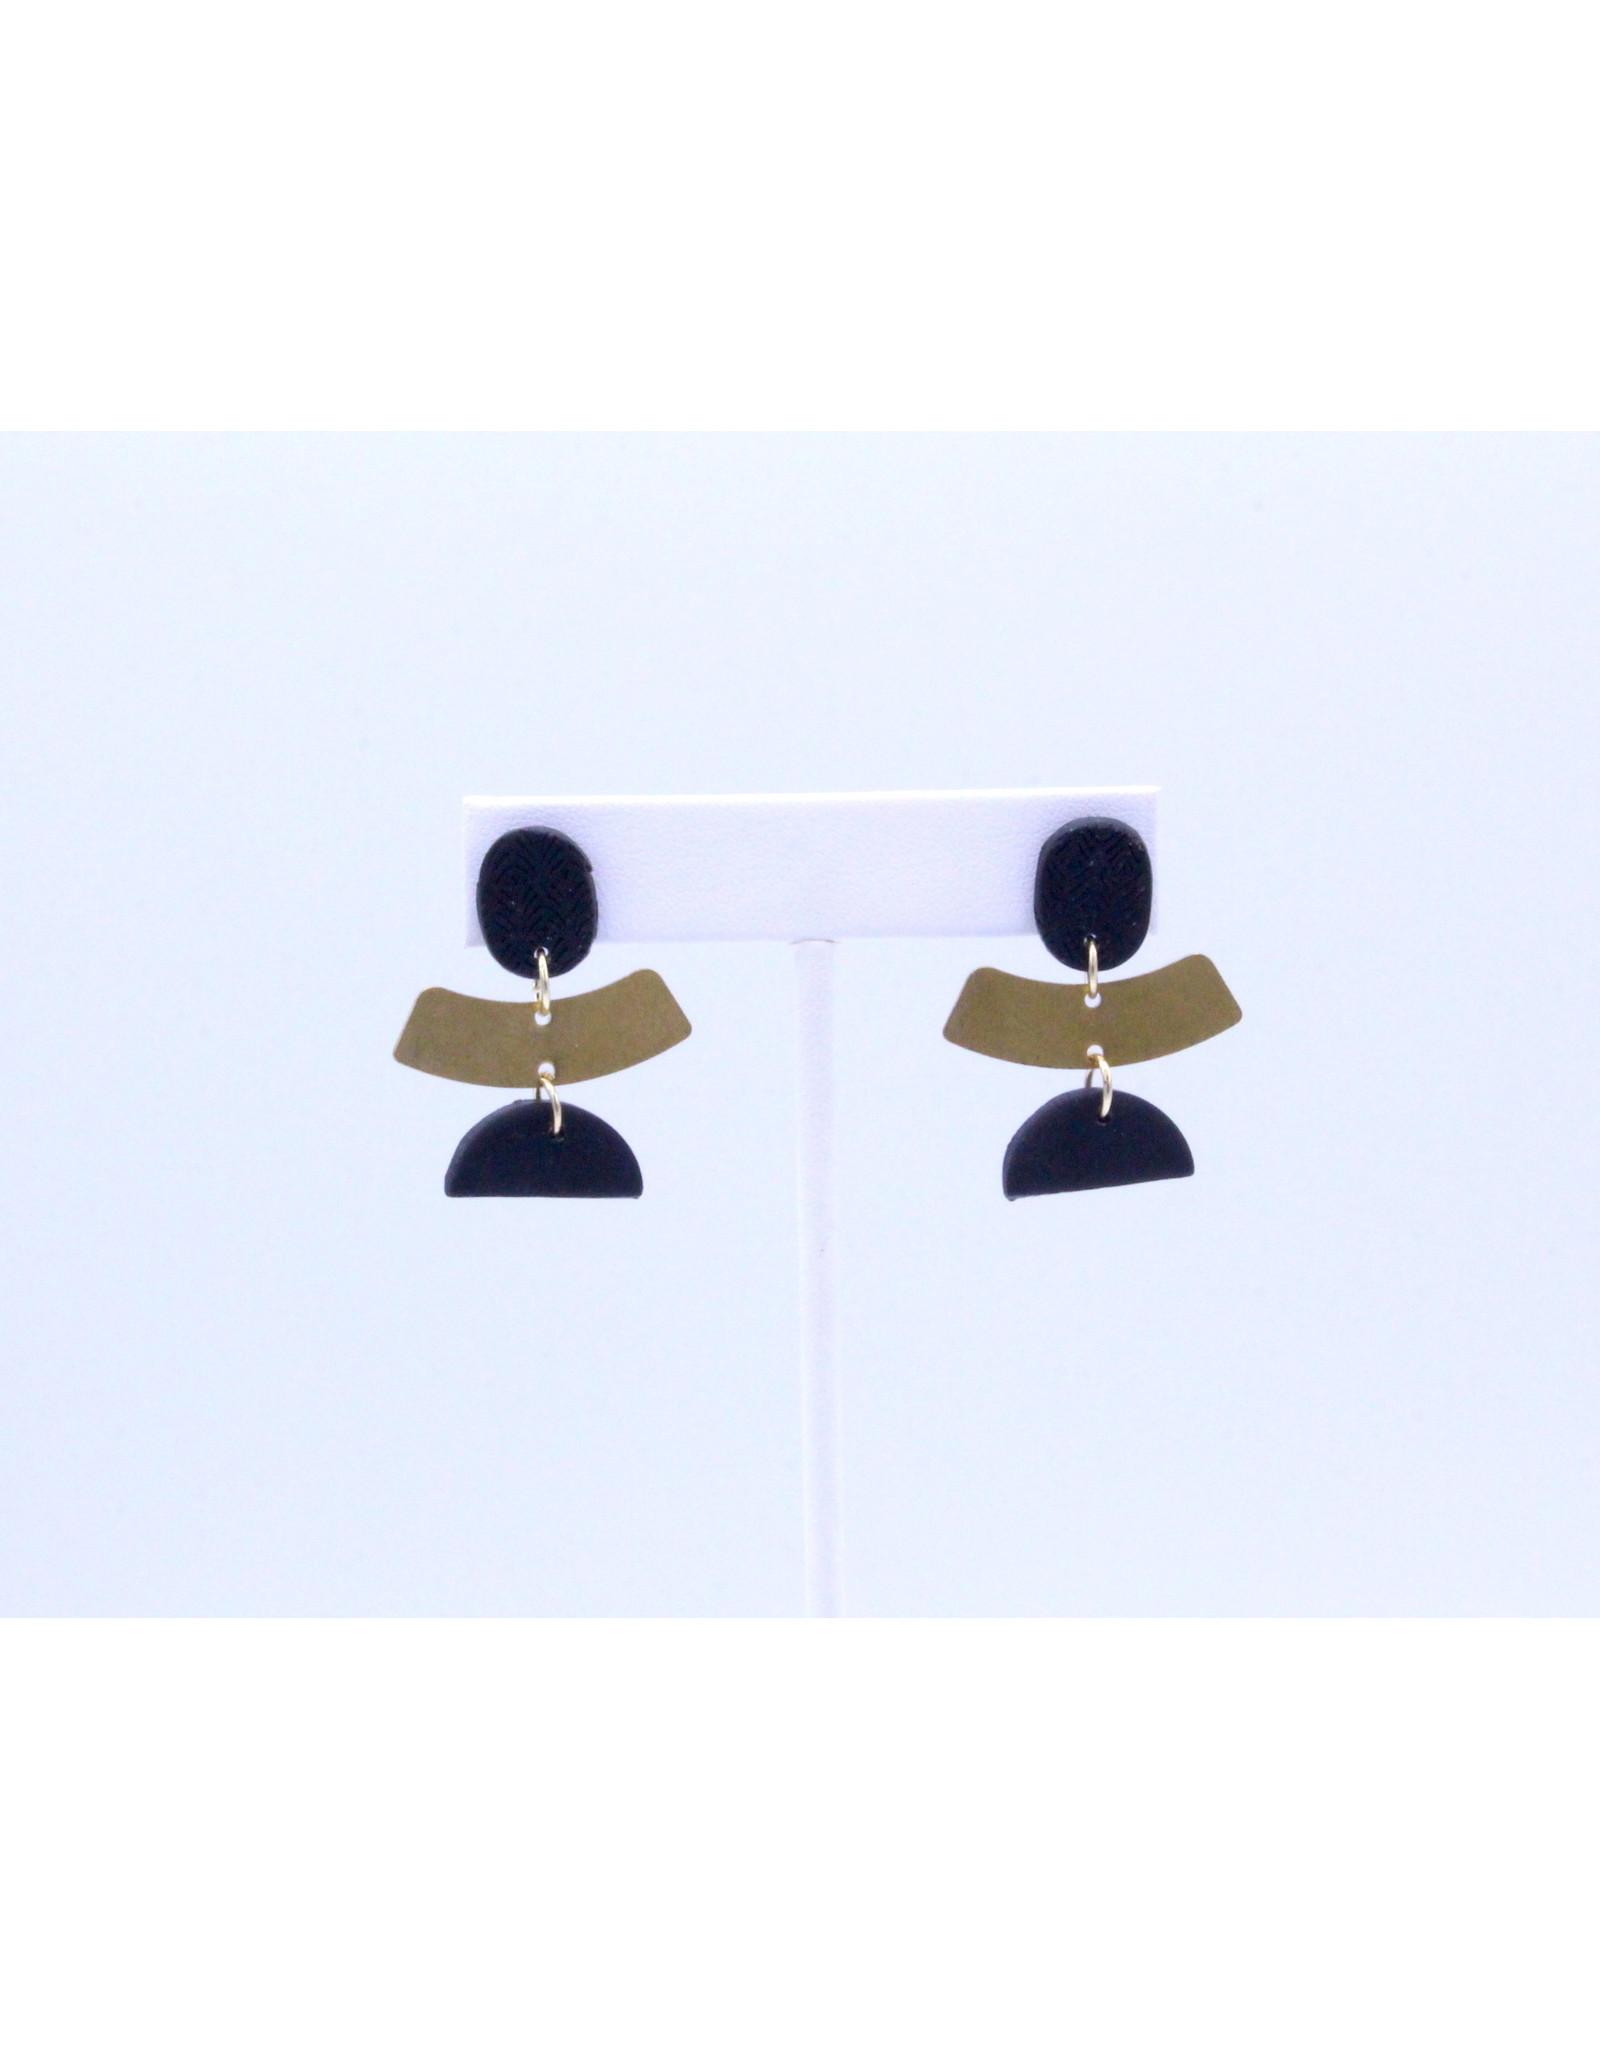 Cleopatra Earrings - Black